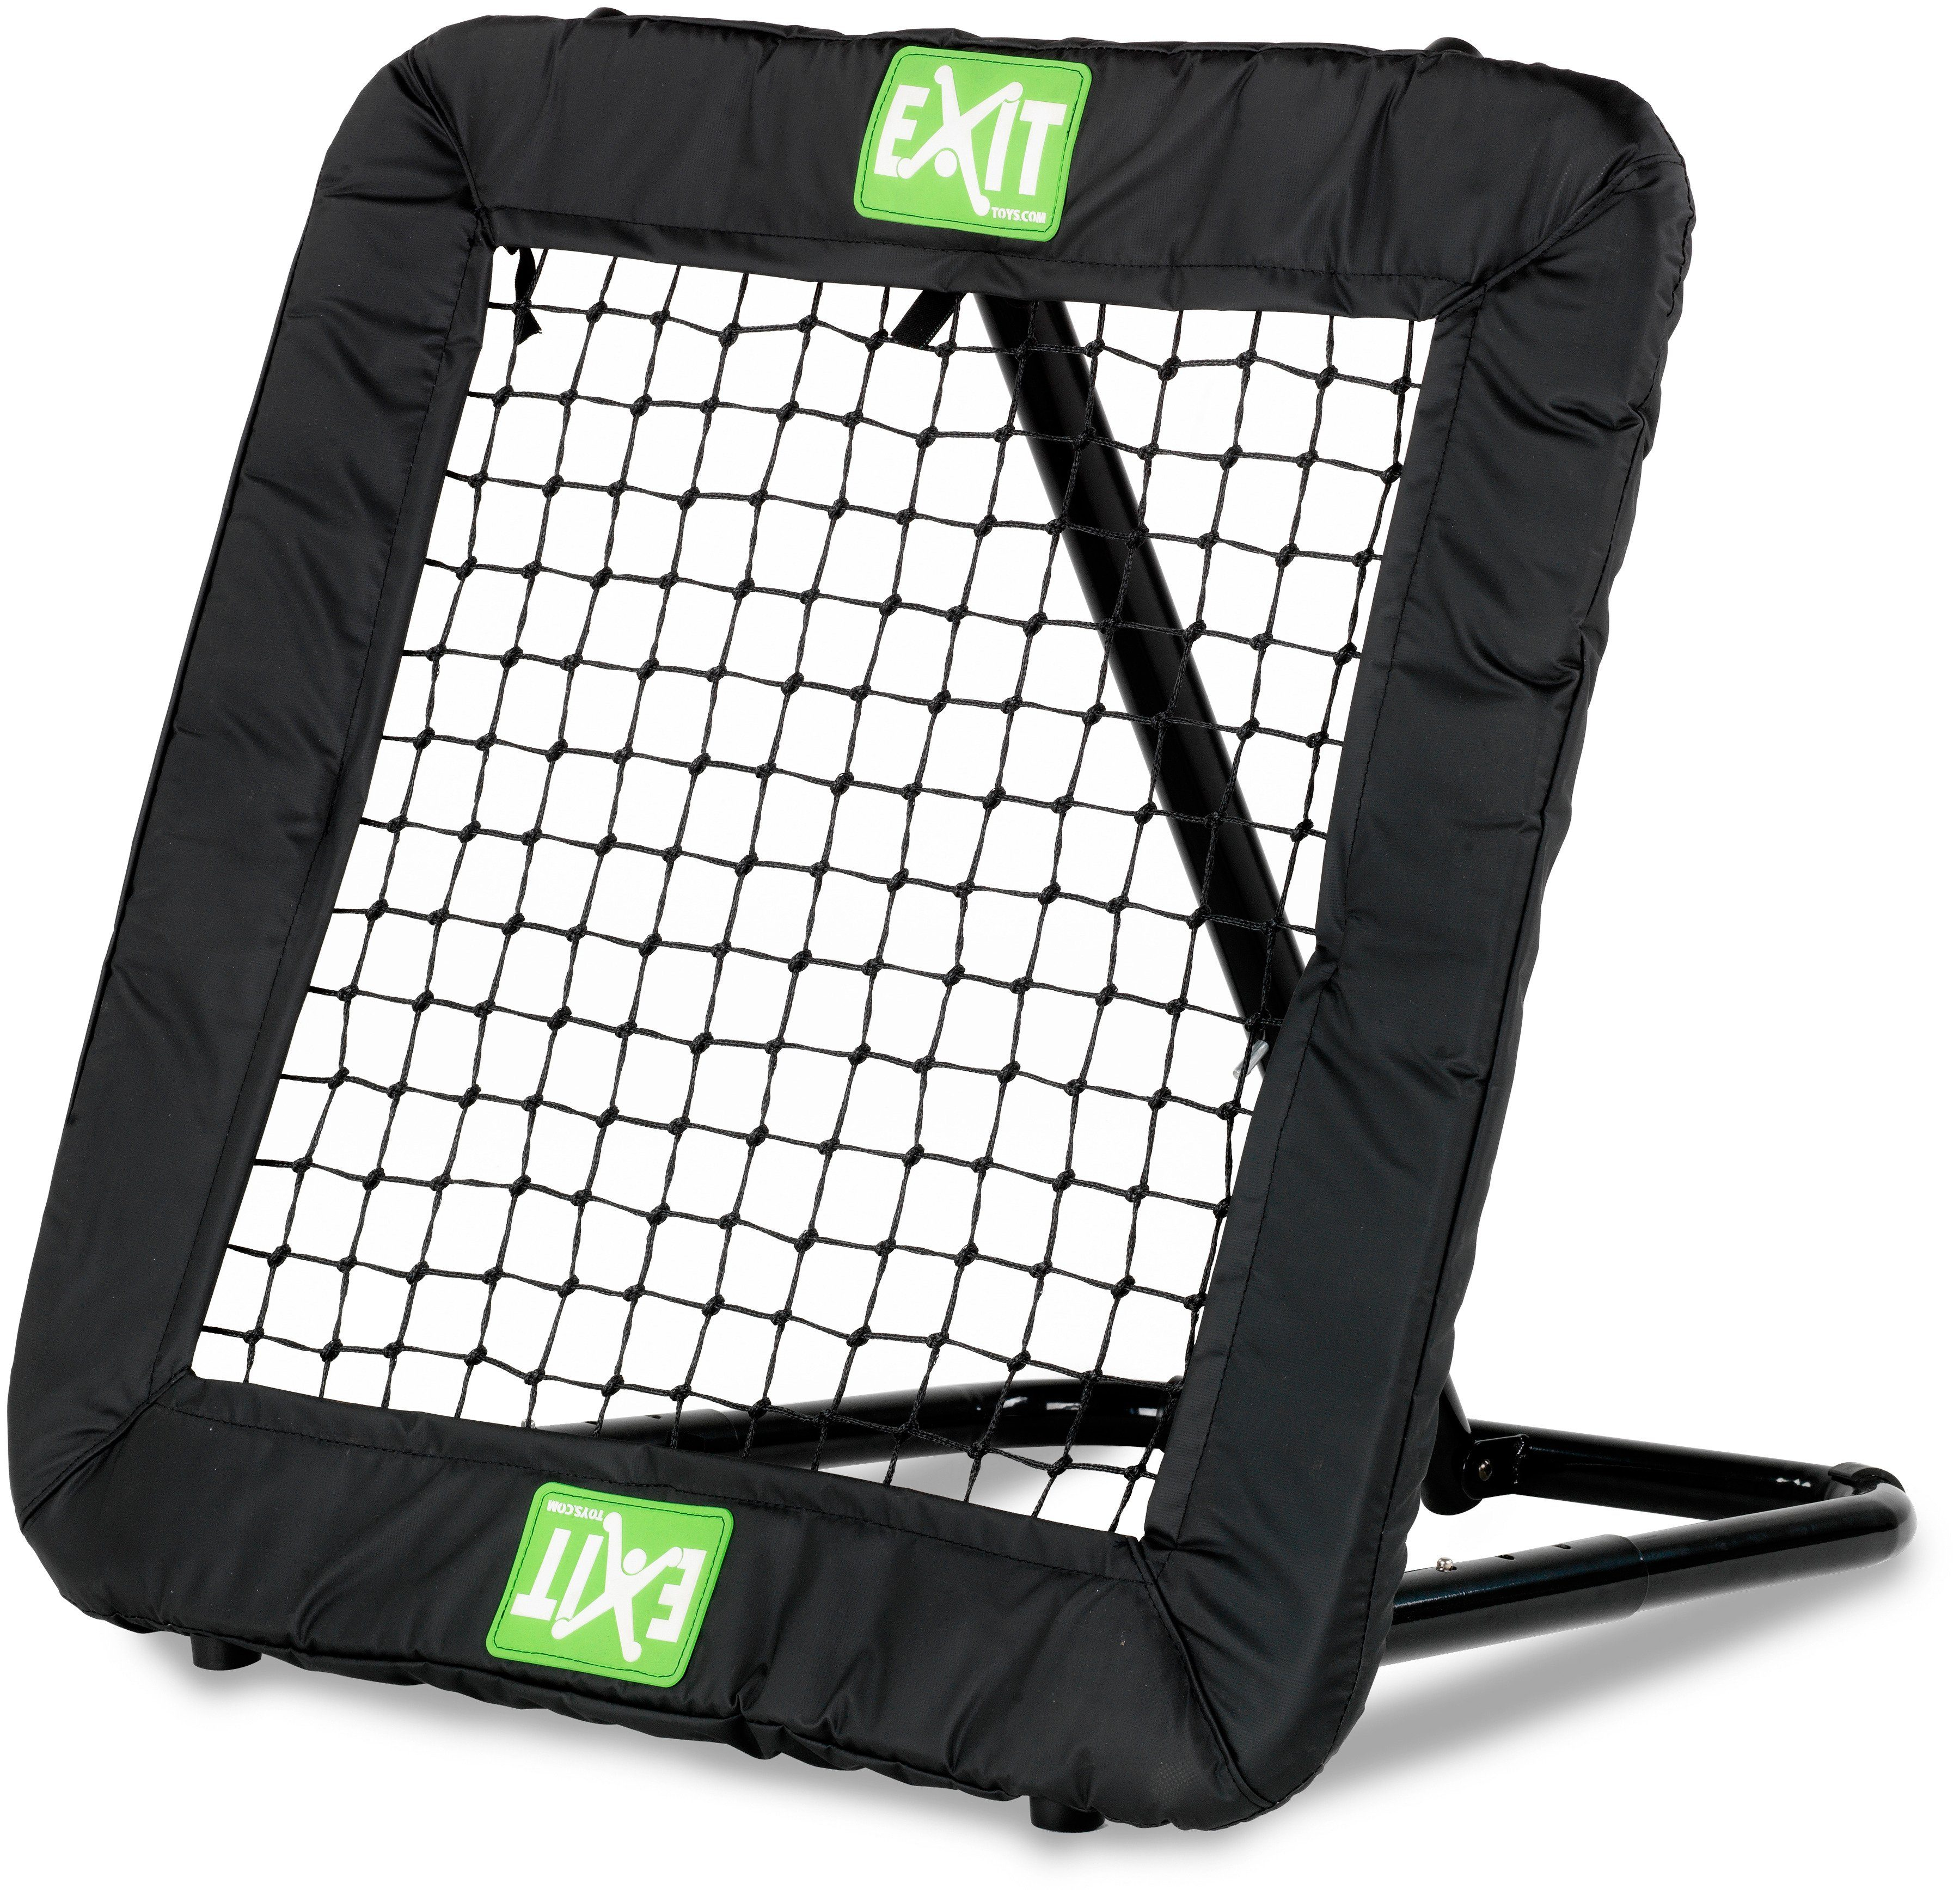 EXIT Rebounder »Kickback M«, BxH: 84x84 cm